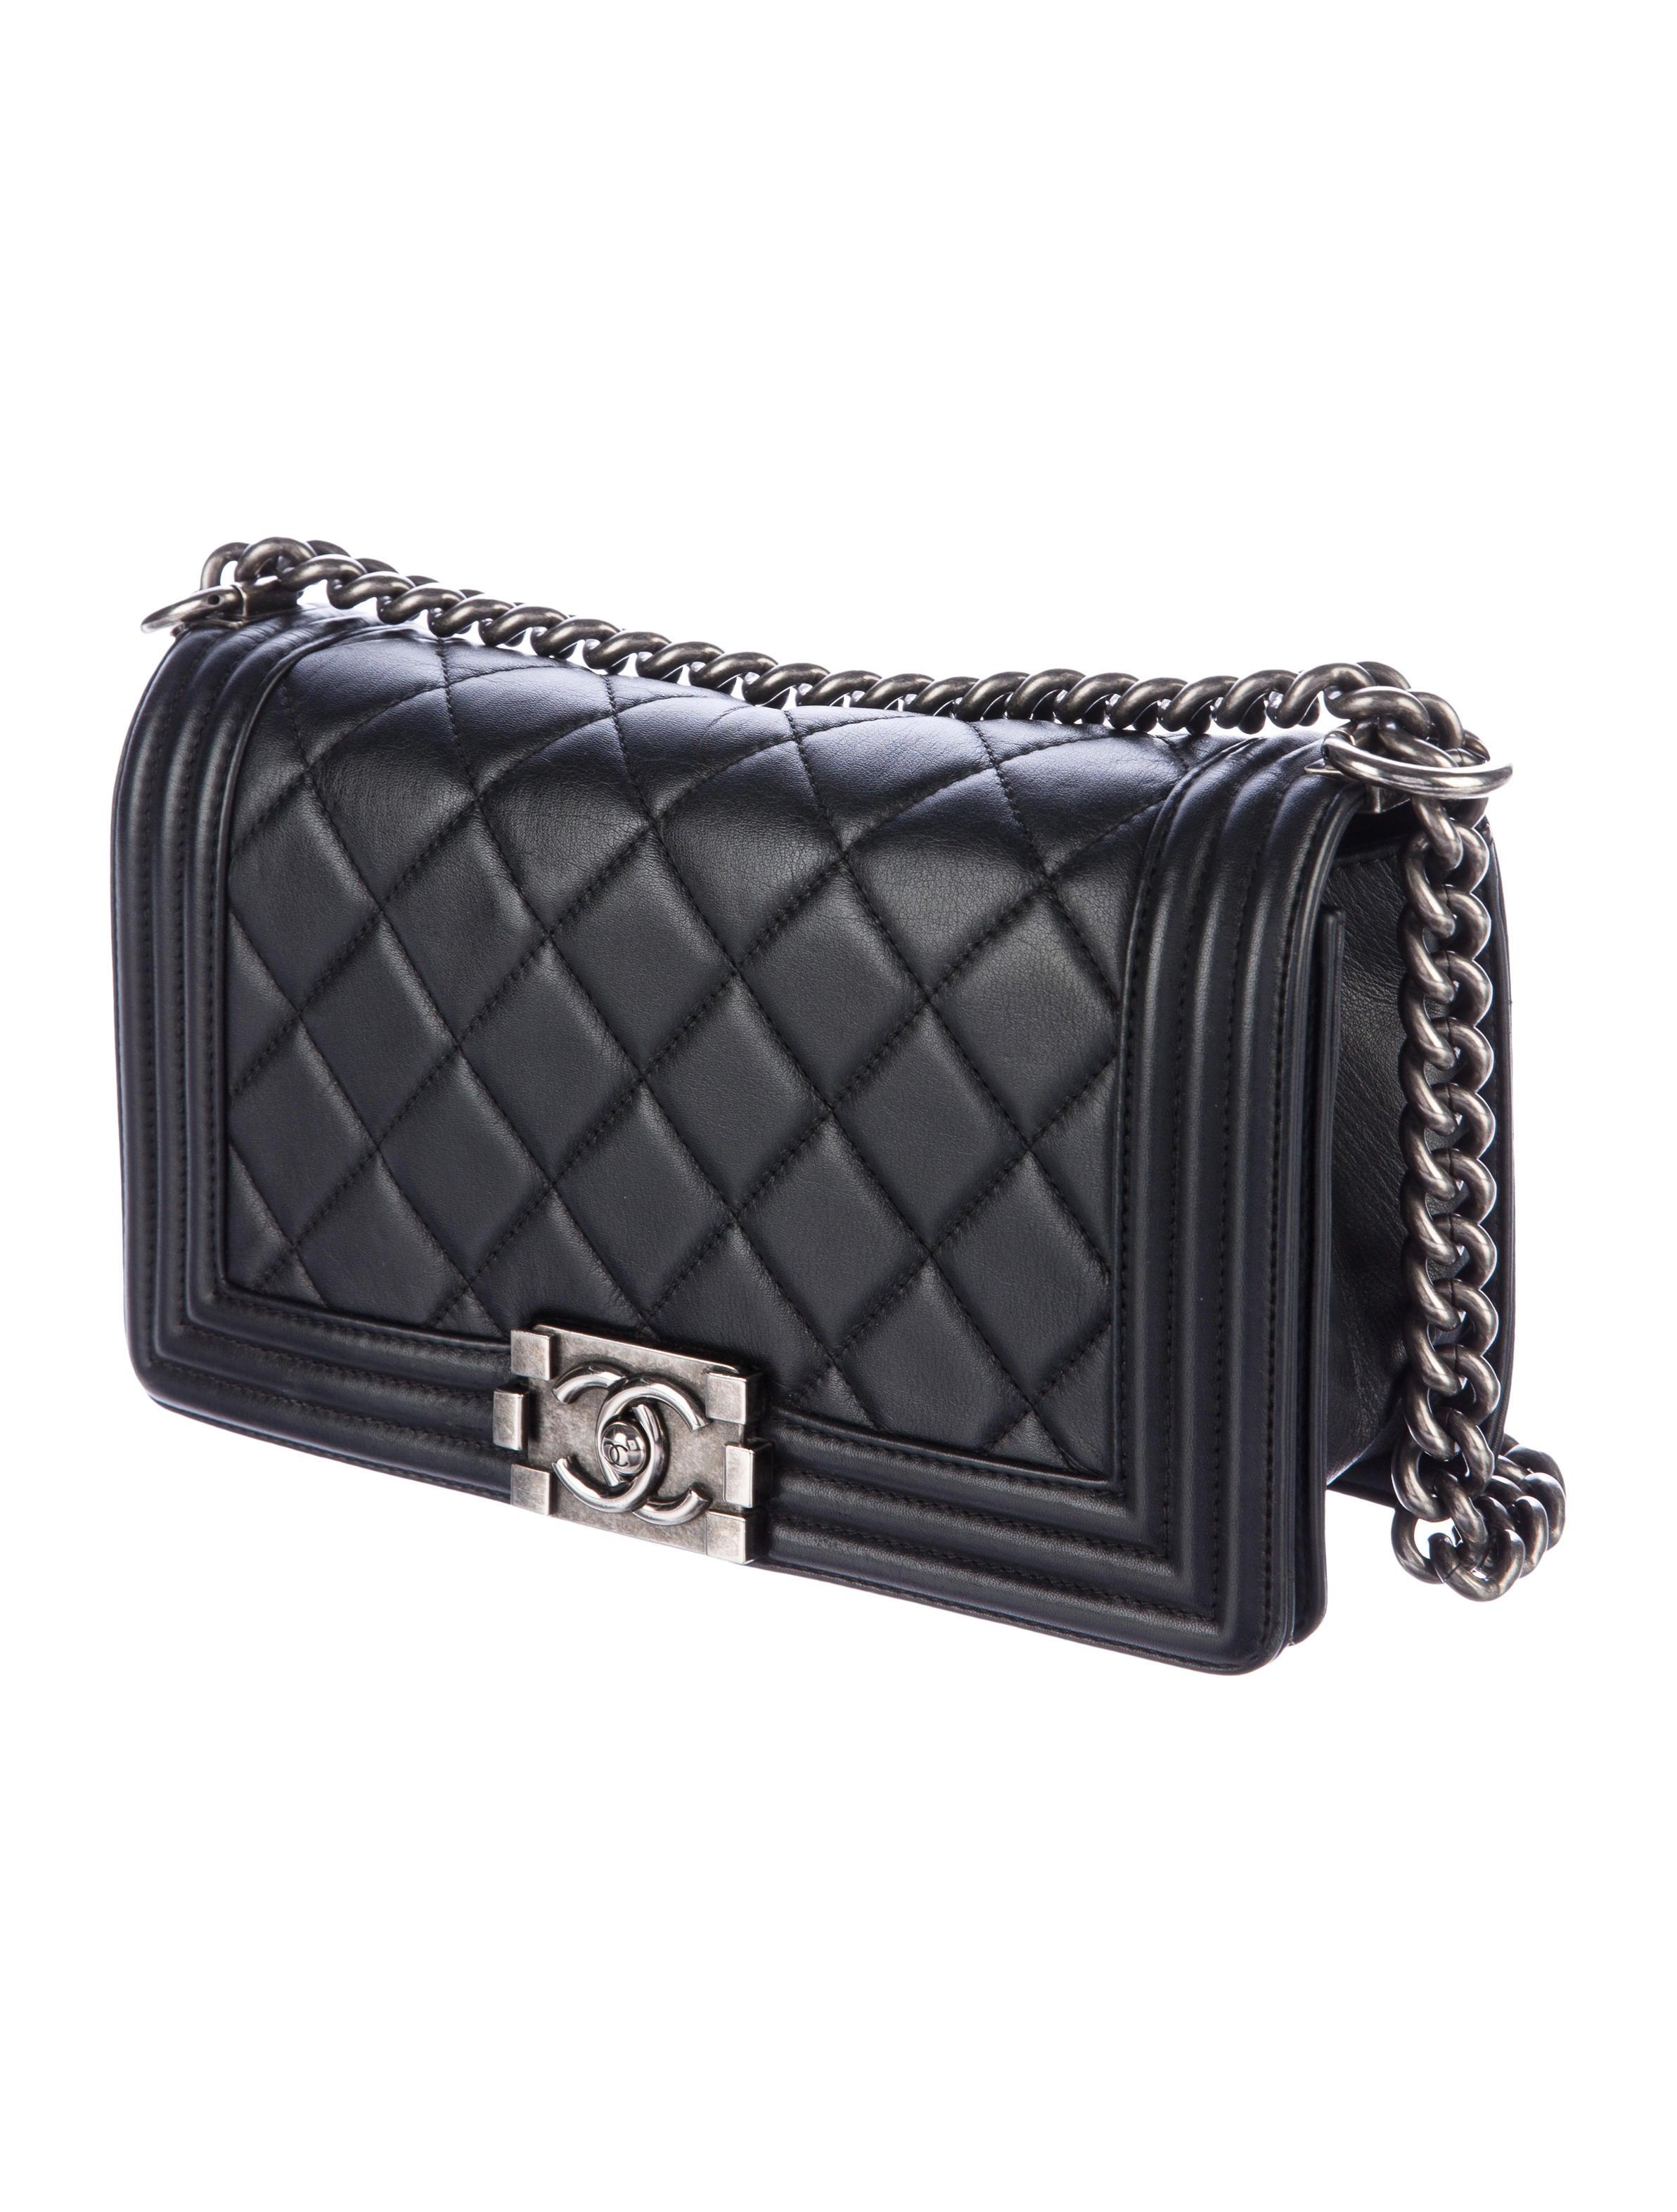 Chanel Quilted Medium Boy Flap Bag